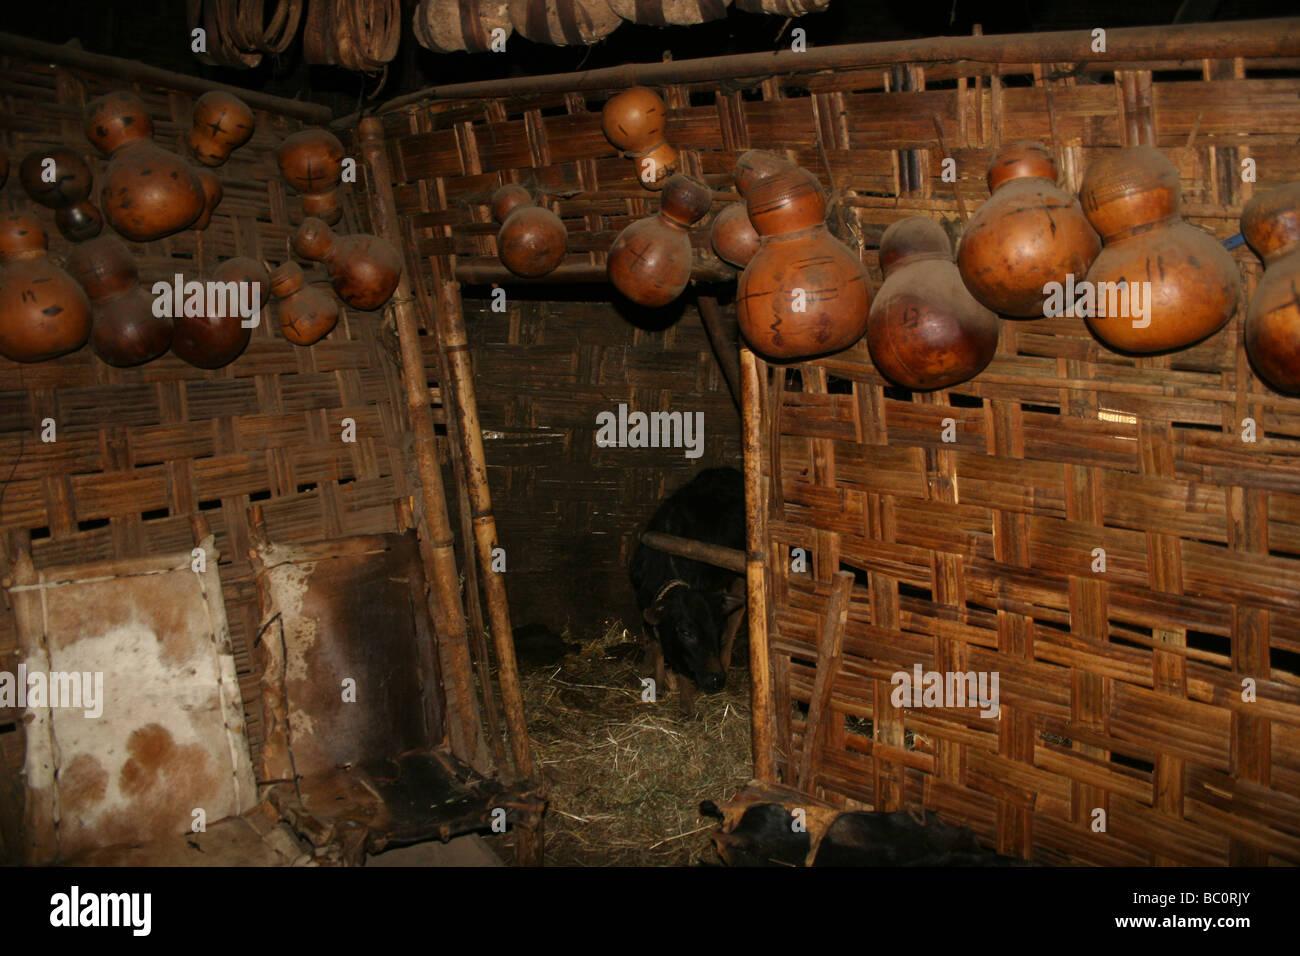 Africa Ethiopia Omo region Chencha Dorze billage interior of a traditional elephant shaped hut - Stock Image